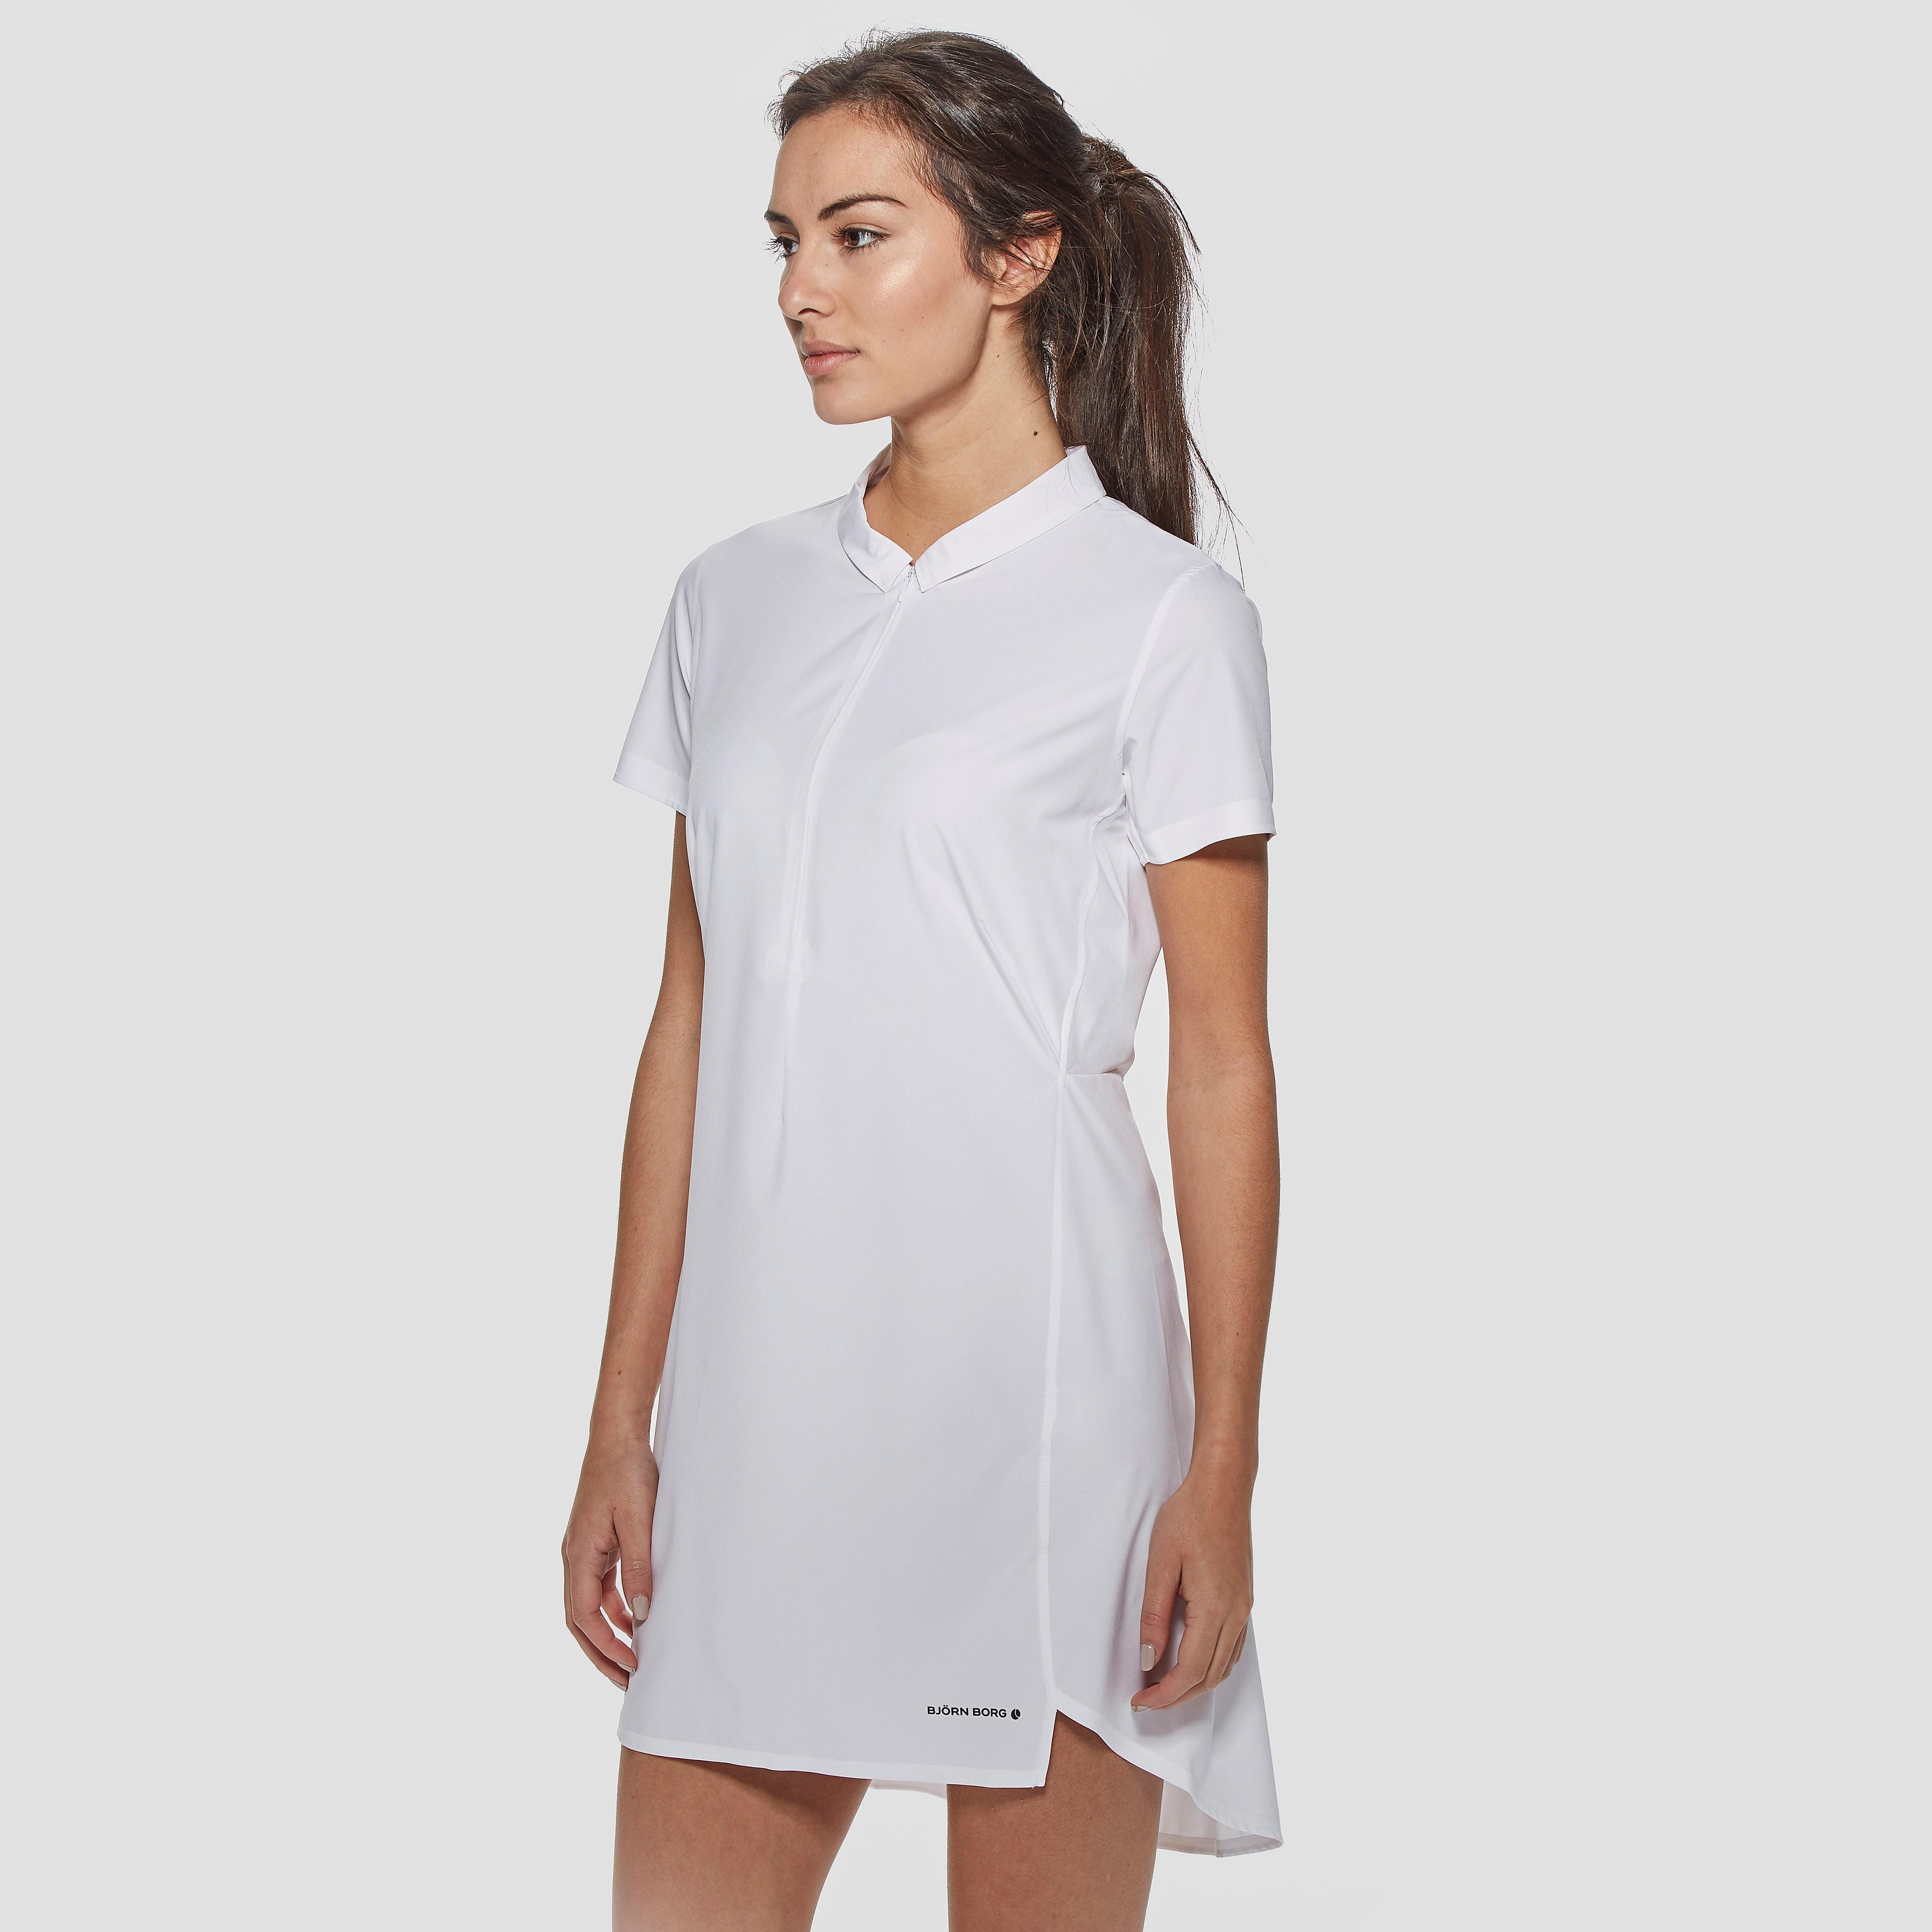 Bjorn Borg Olivia Polo Women's Tennis Dress